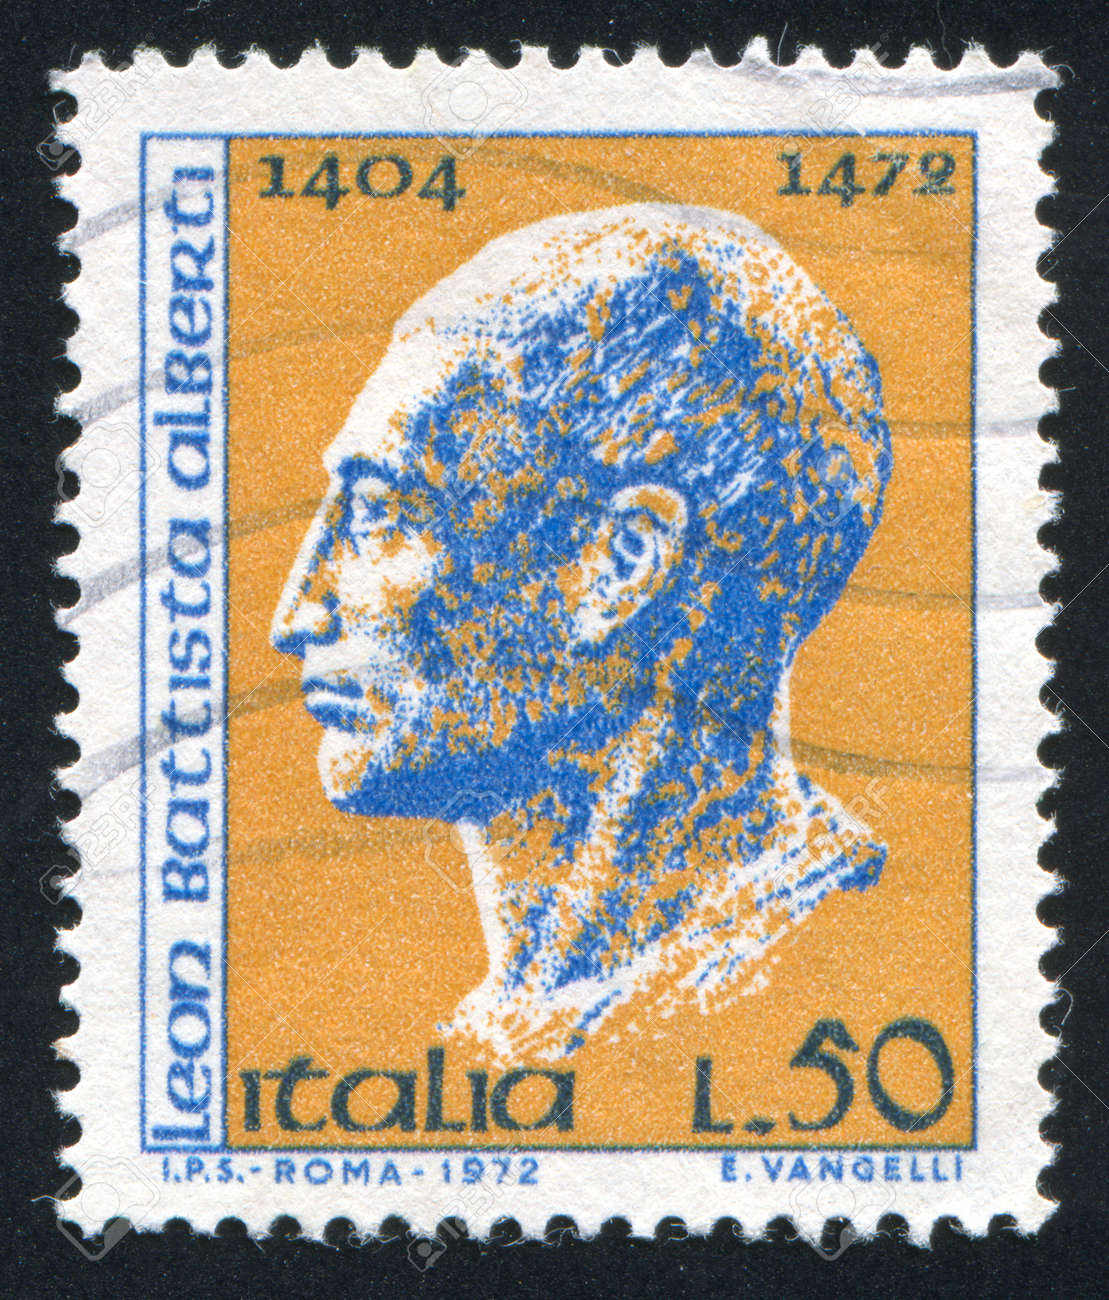 ITALY - CIRCA 1972: stamp printed by Italy, shows Leon Batista Alberti, circa 1972 Stock Photo - 16285120